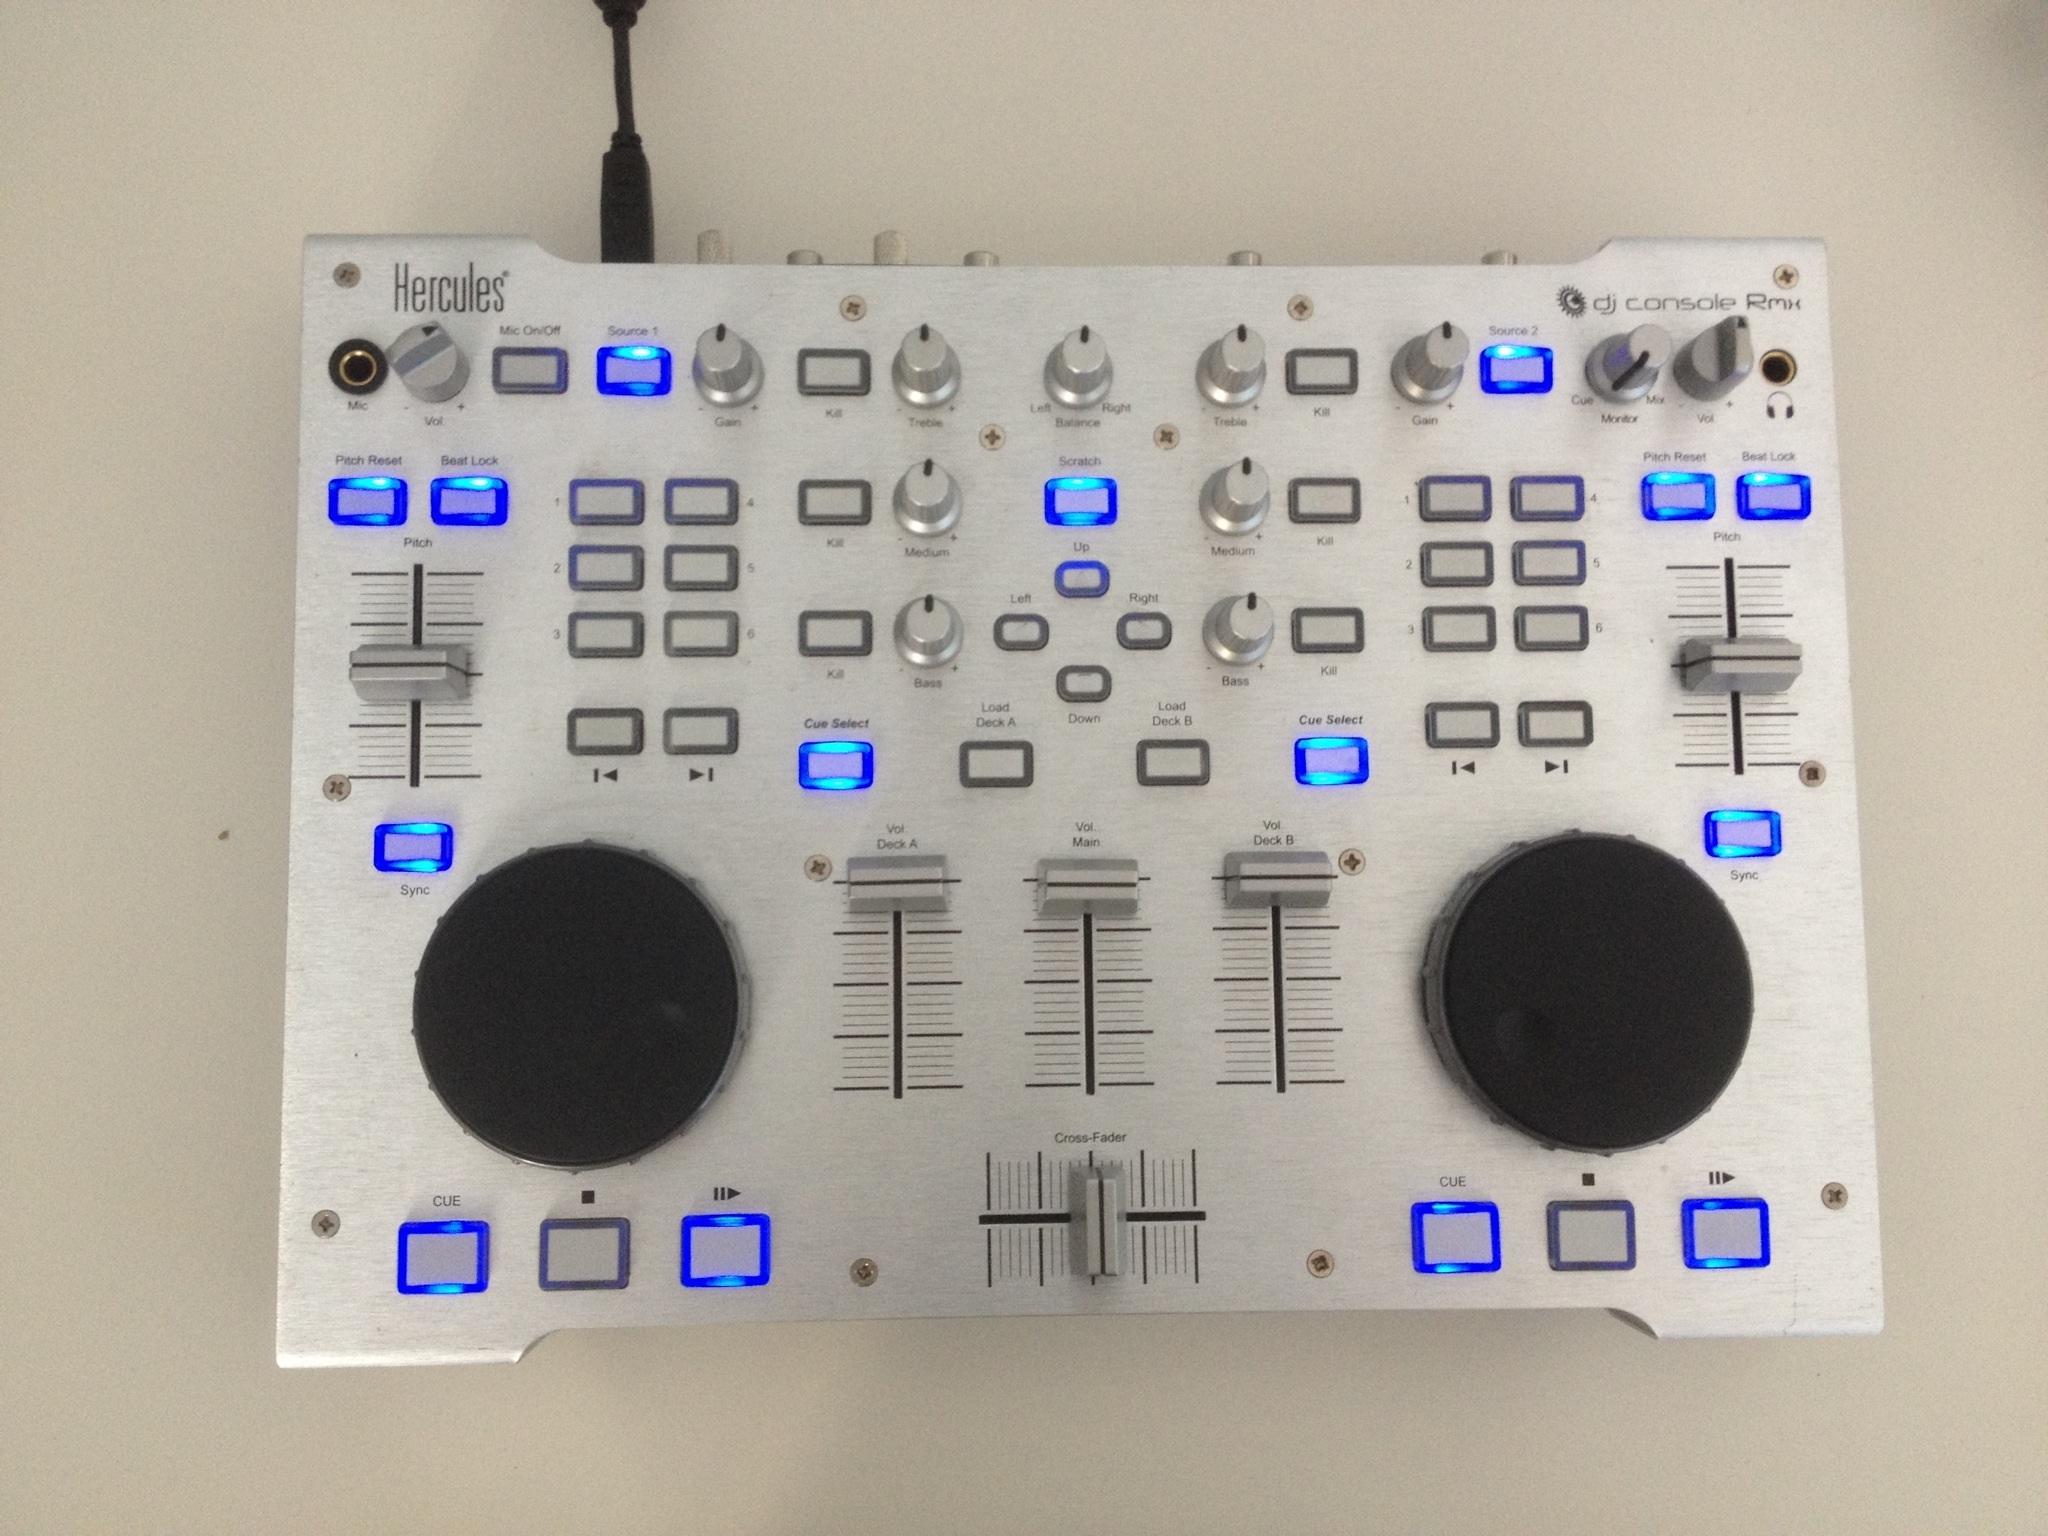 table de mixage hercules dj console rmx